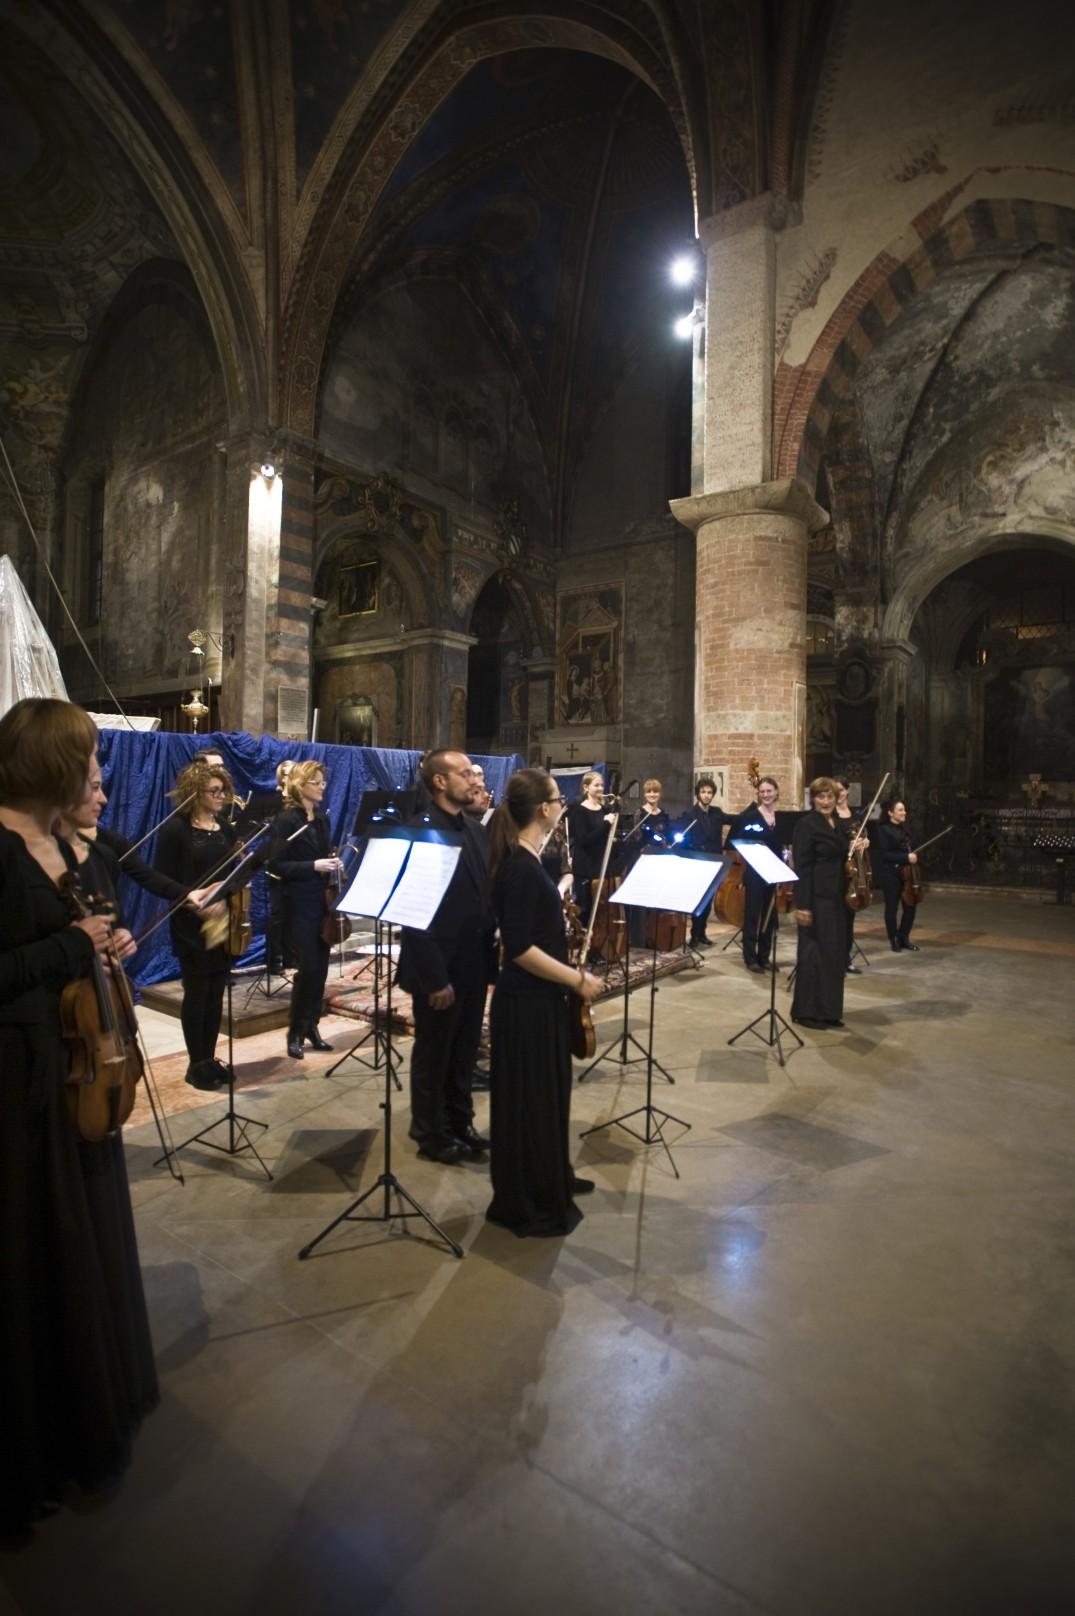 Lodi, Chiesa di San Francesco, 23.10.2014